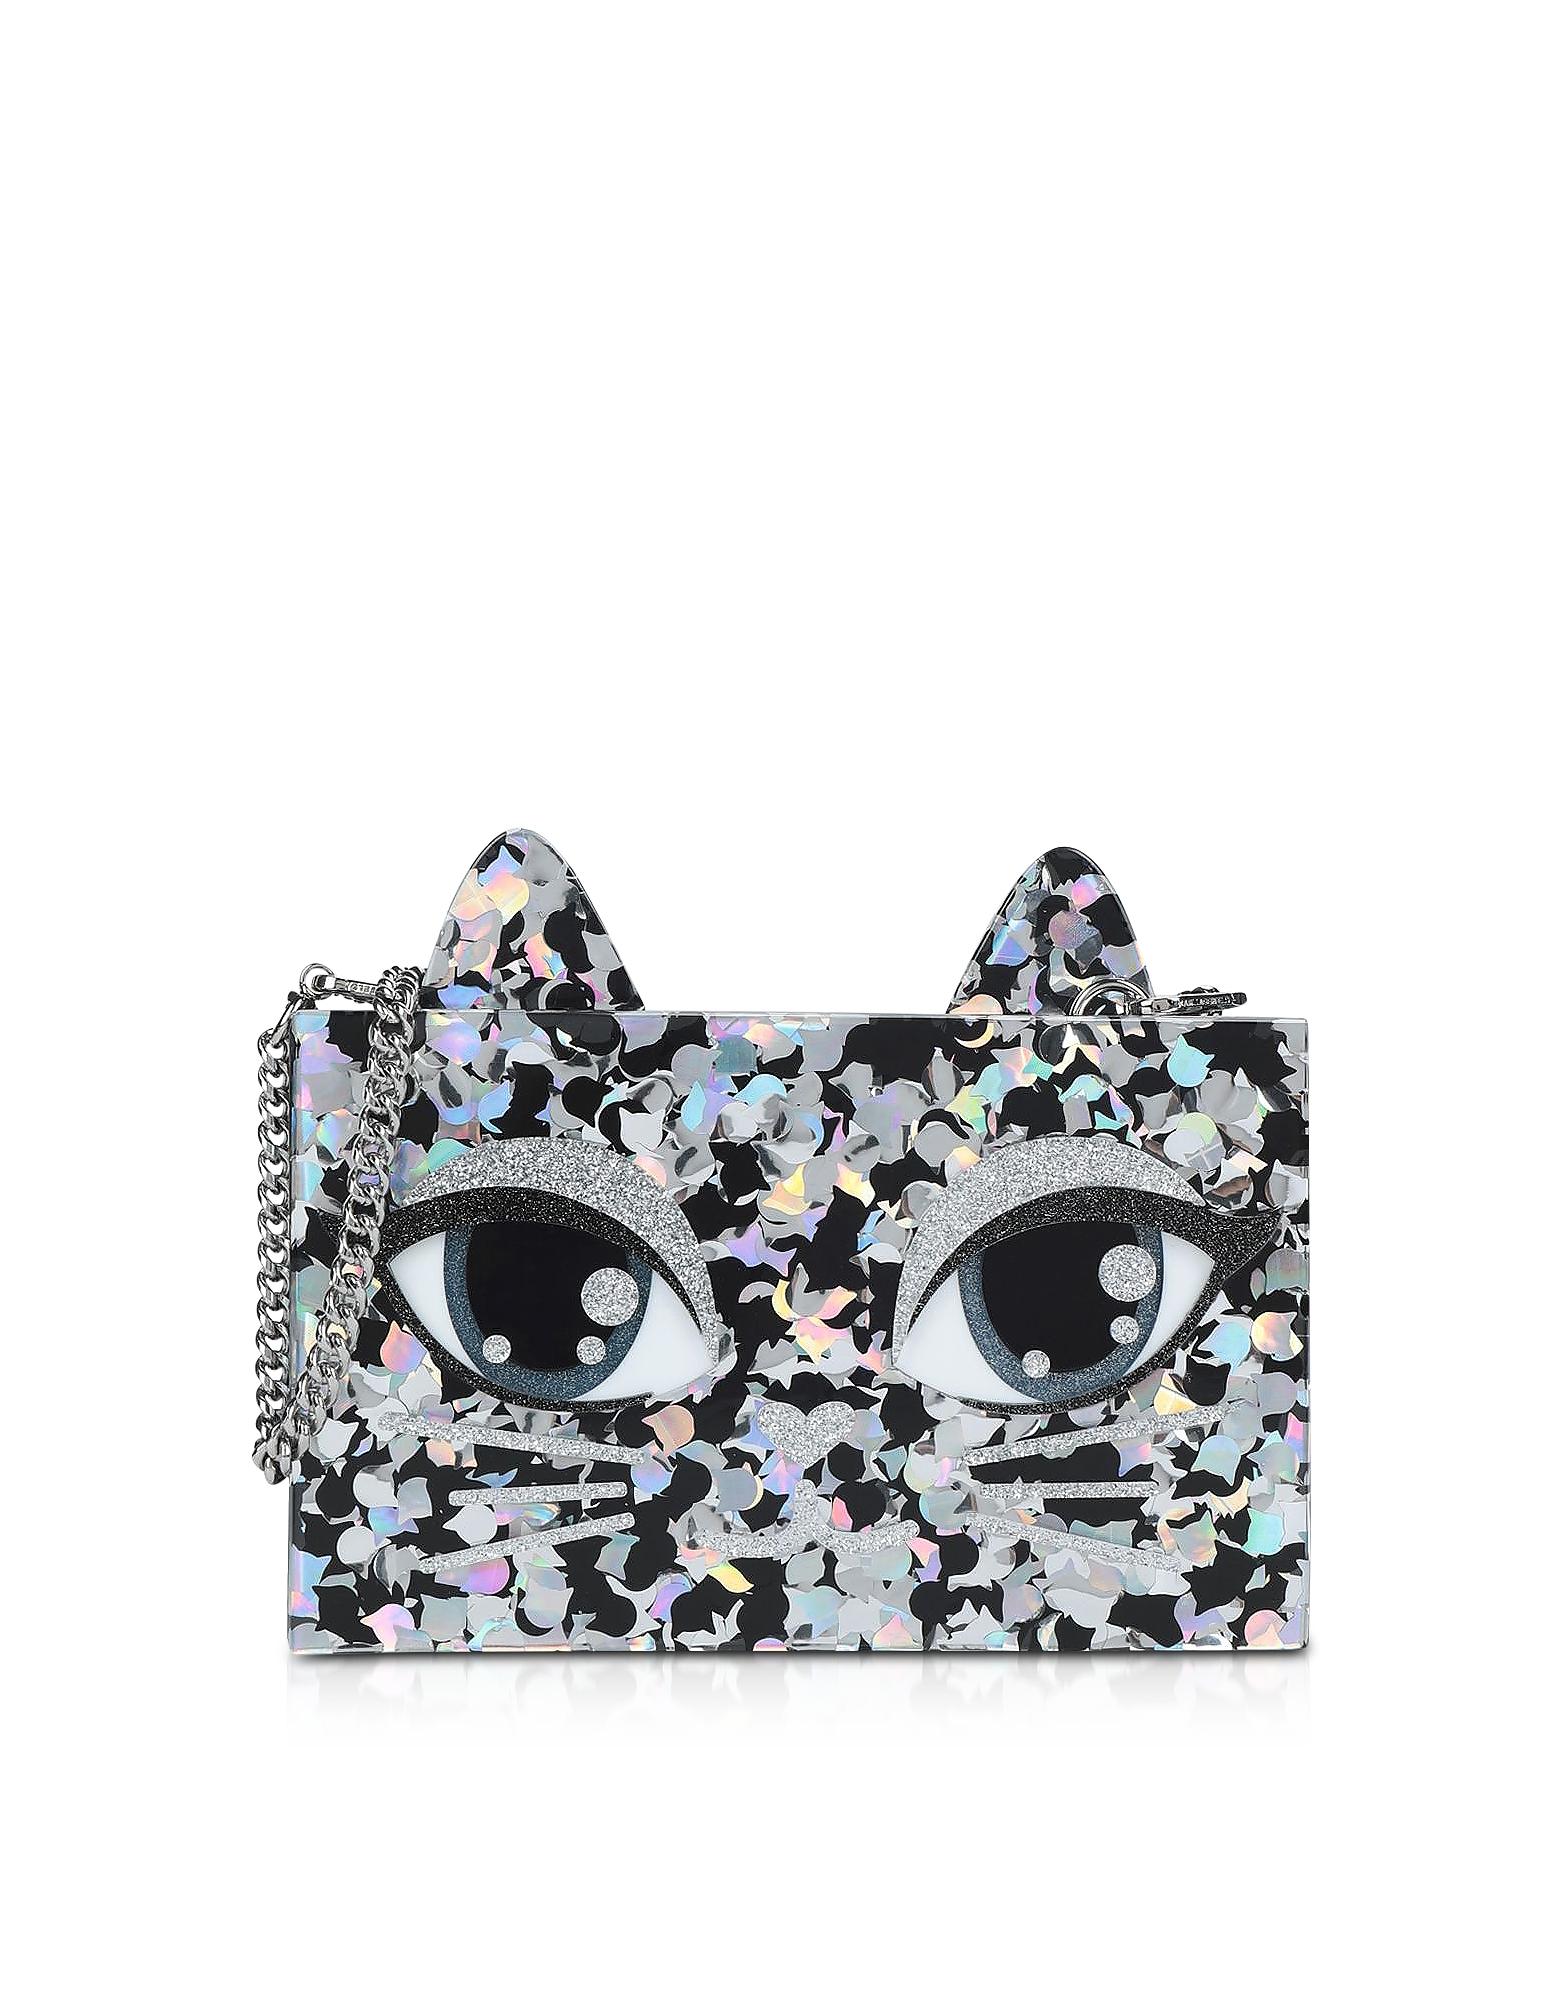 Karl Lagerfeld Handbags, Choupette Glitter Minaudiere Clutch